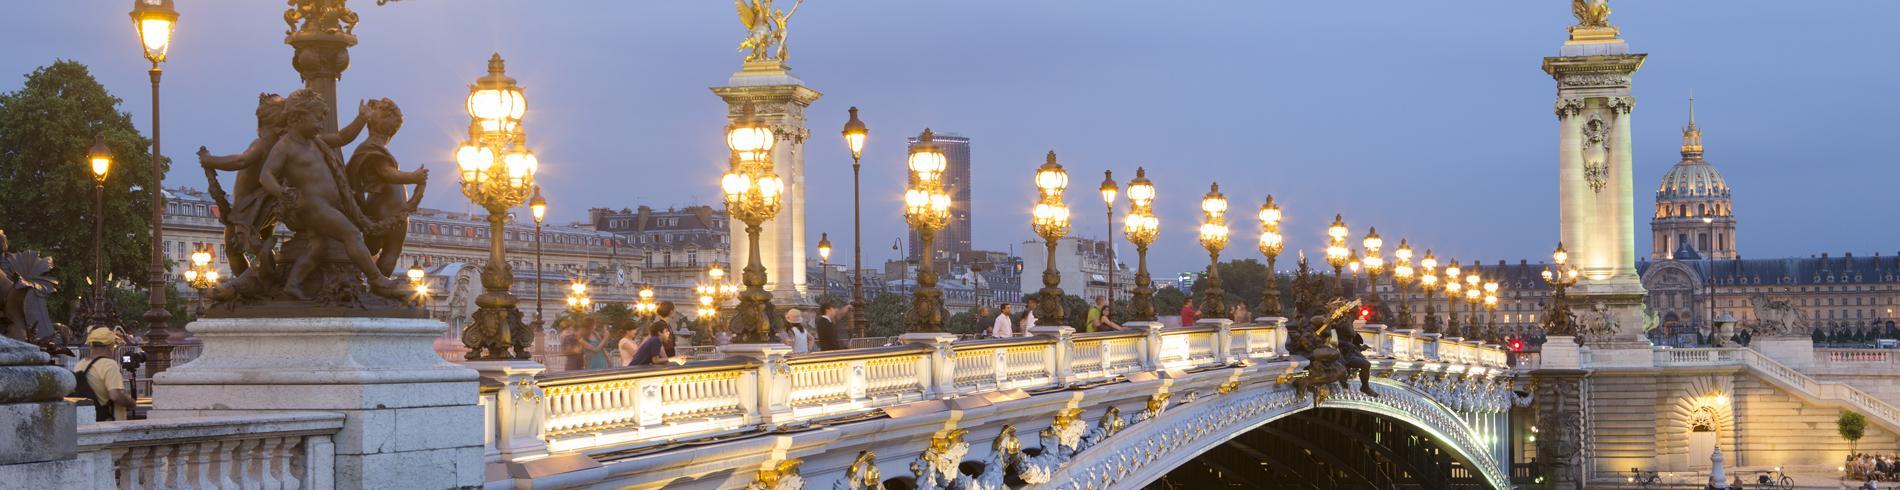 Pont Alexandre 3 at night